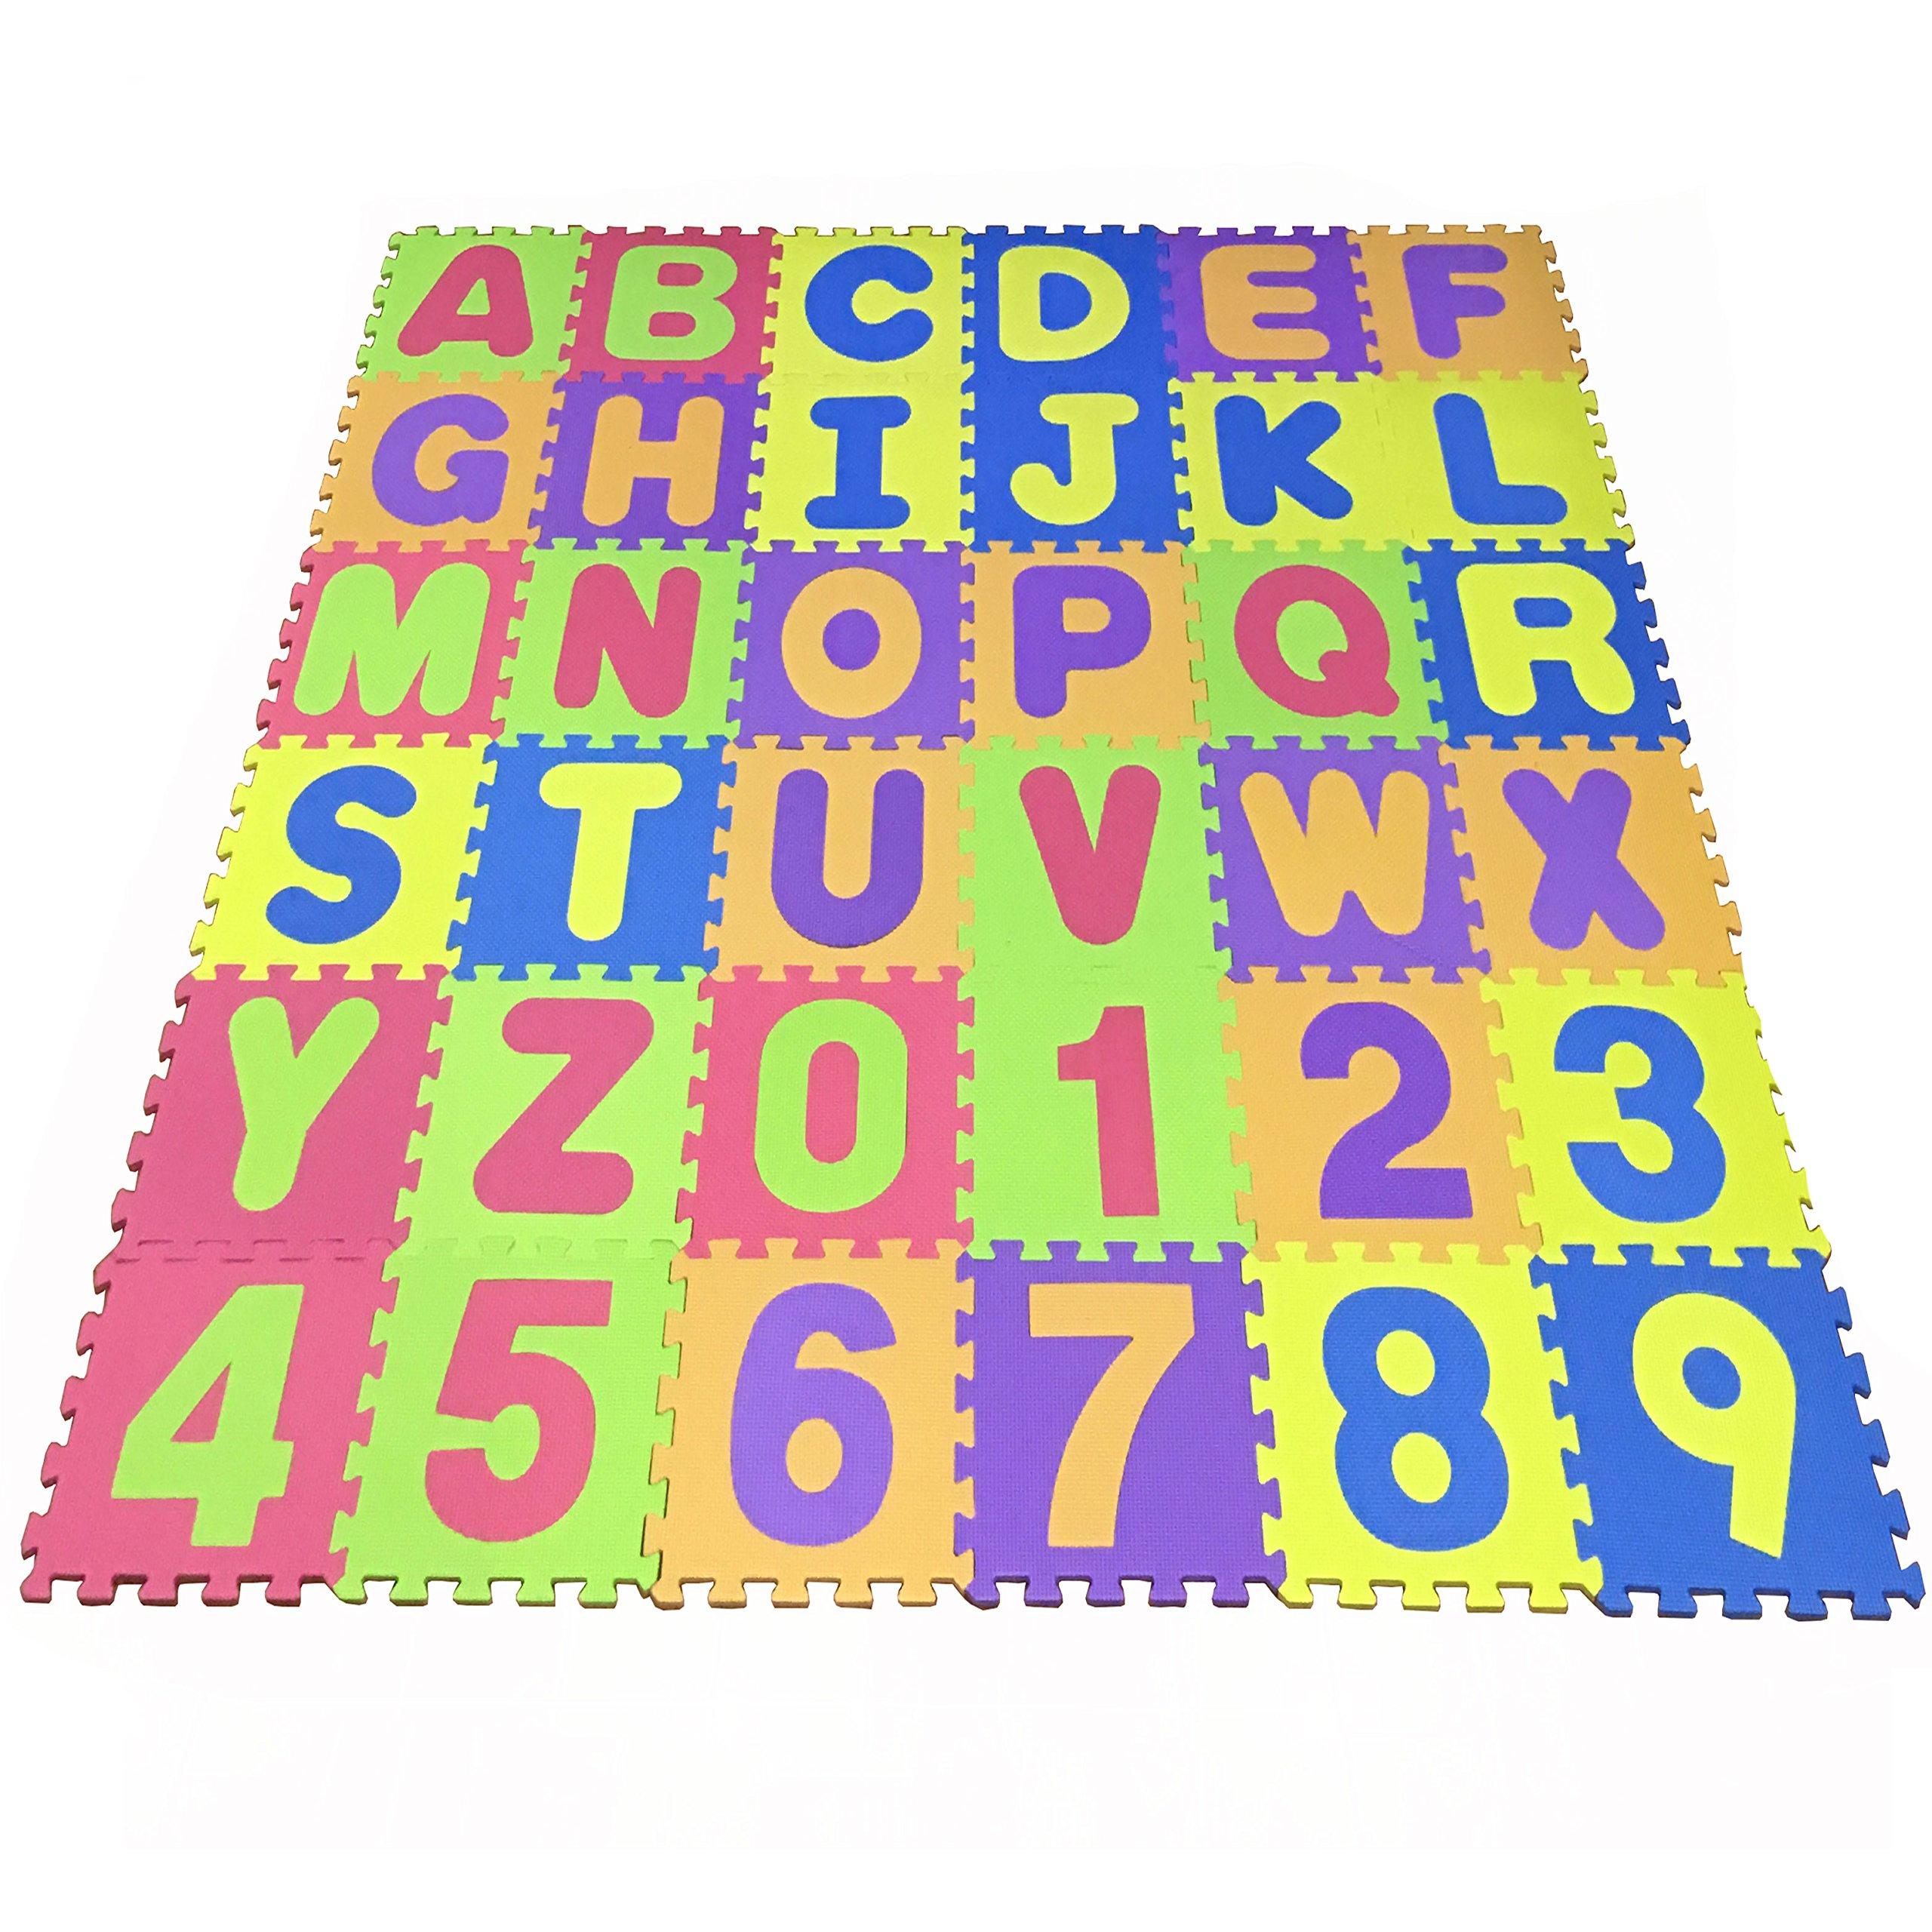 Puzzle Play Mat,Foam Floor Play Mat,Foam Interlocking Tiles,Alphabet & Number Foam Puzzle Mat,NON-TOXIC EVA 36 Piece Multi-Color Children Play & Exercise Mat (Large) (Large) by Chuanyue (Image #1)